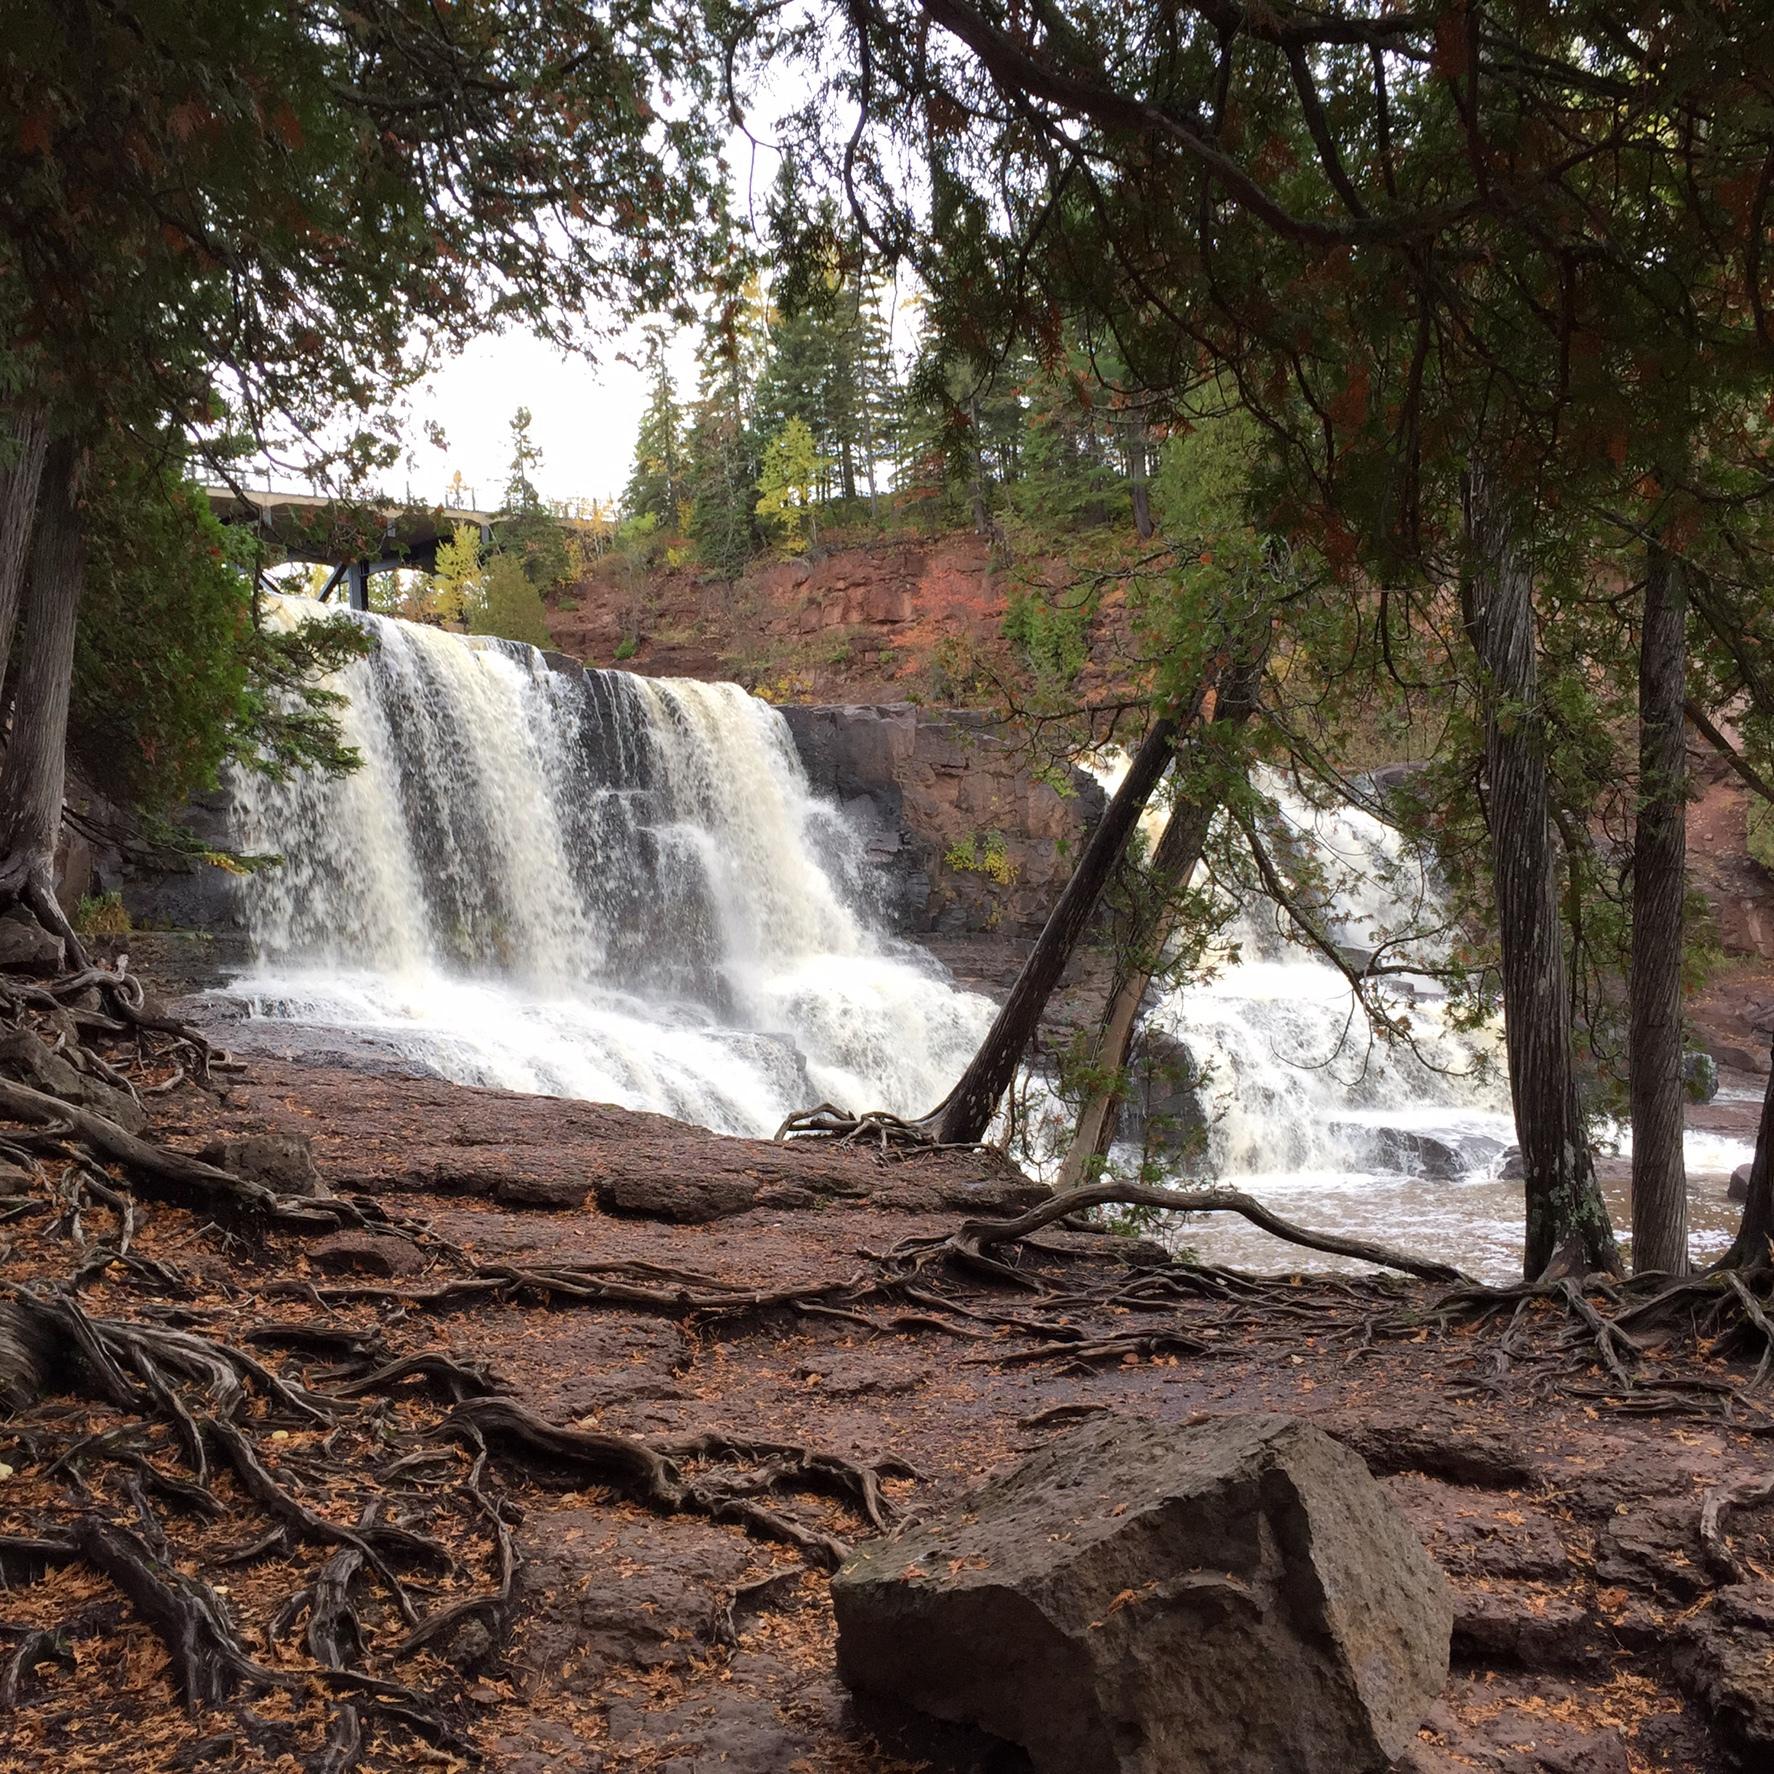 Minnesota State Park Series - Gooseberry Falls State Park